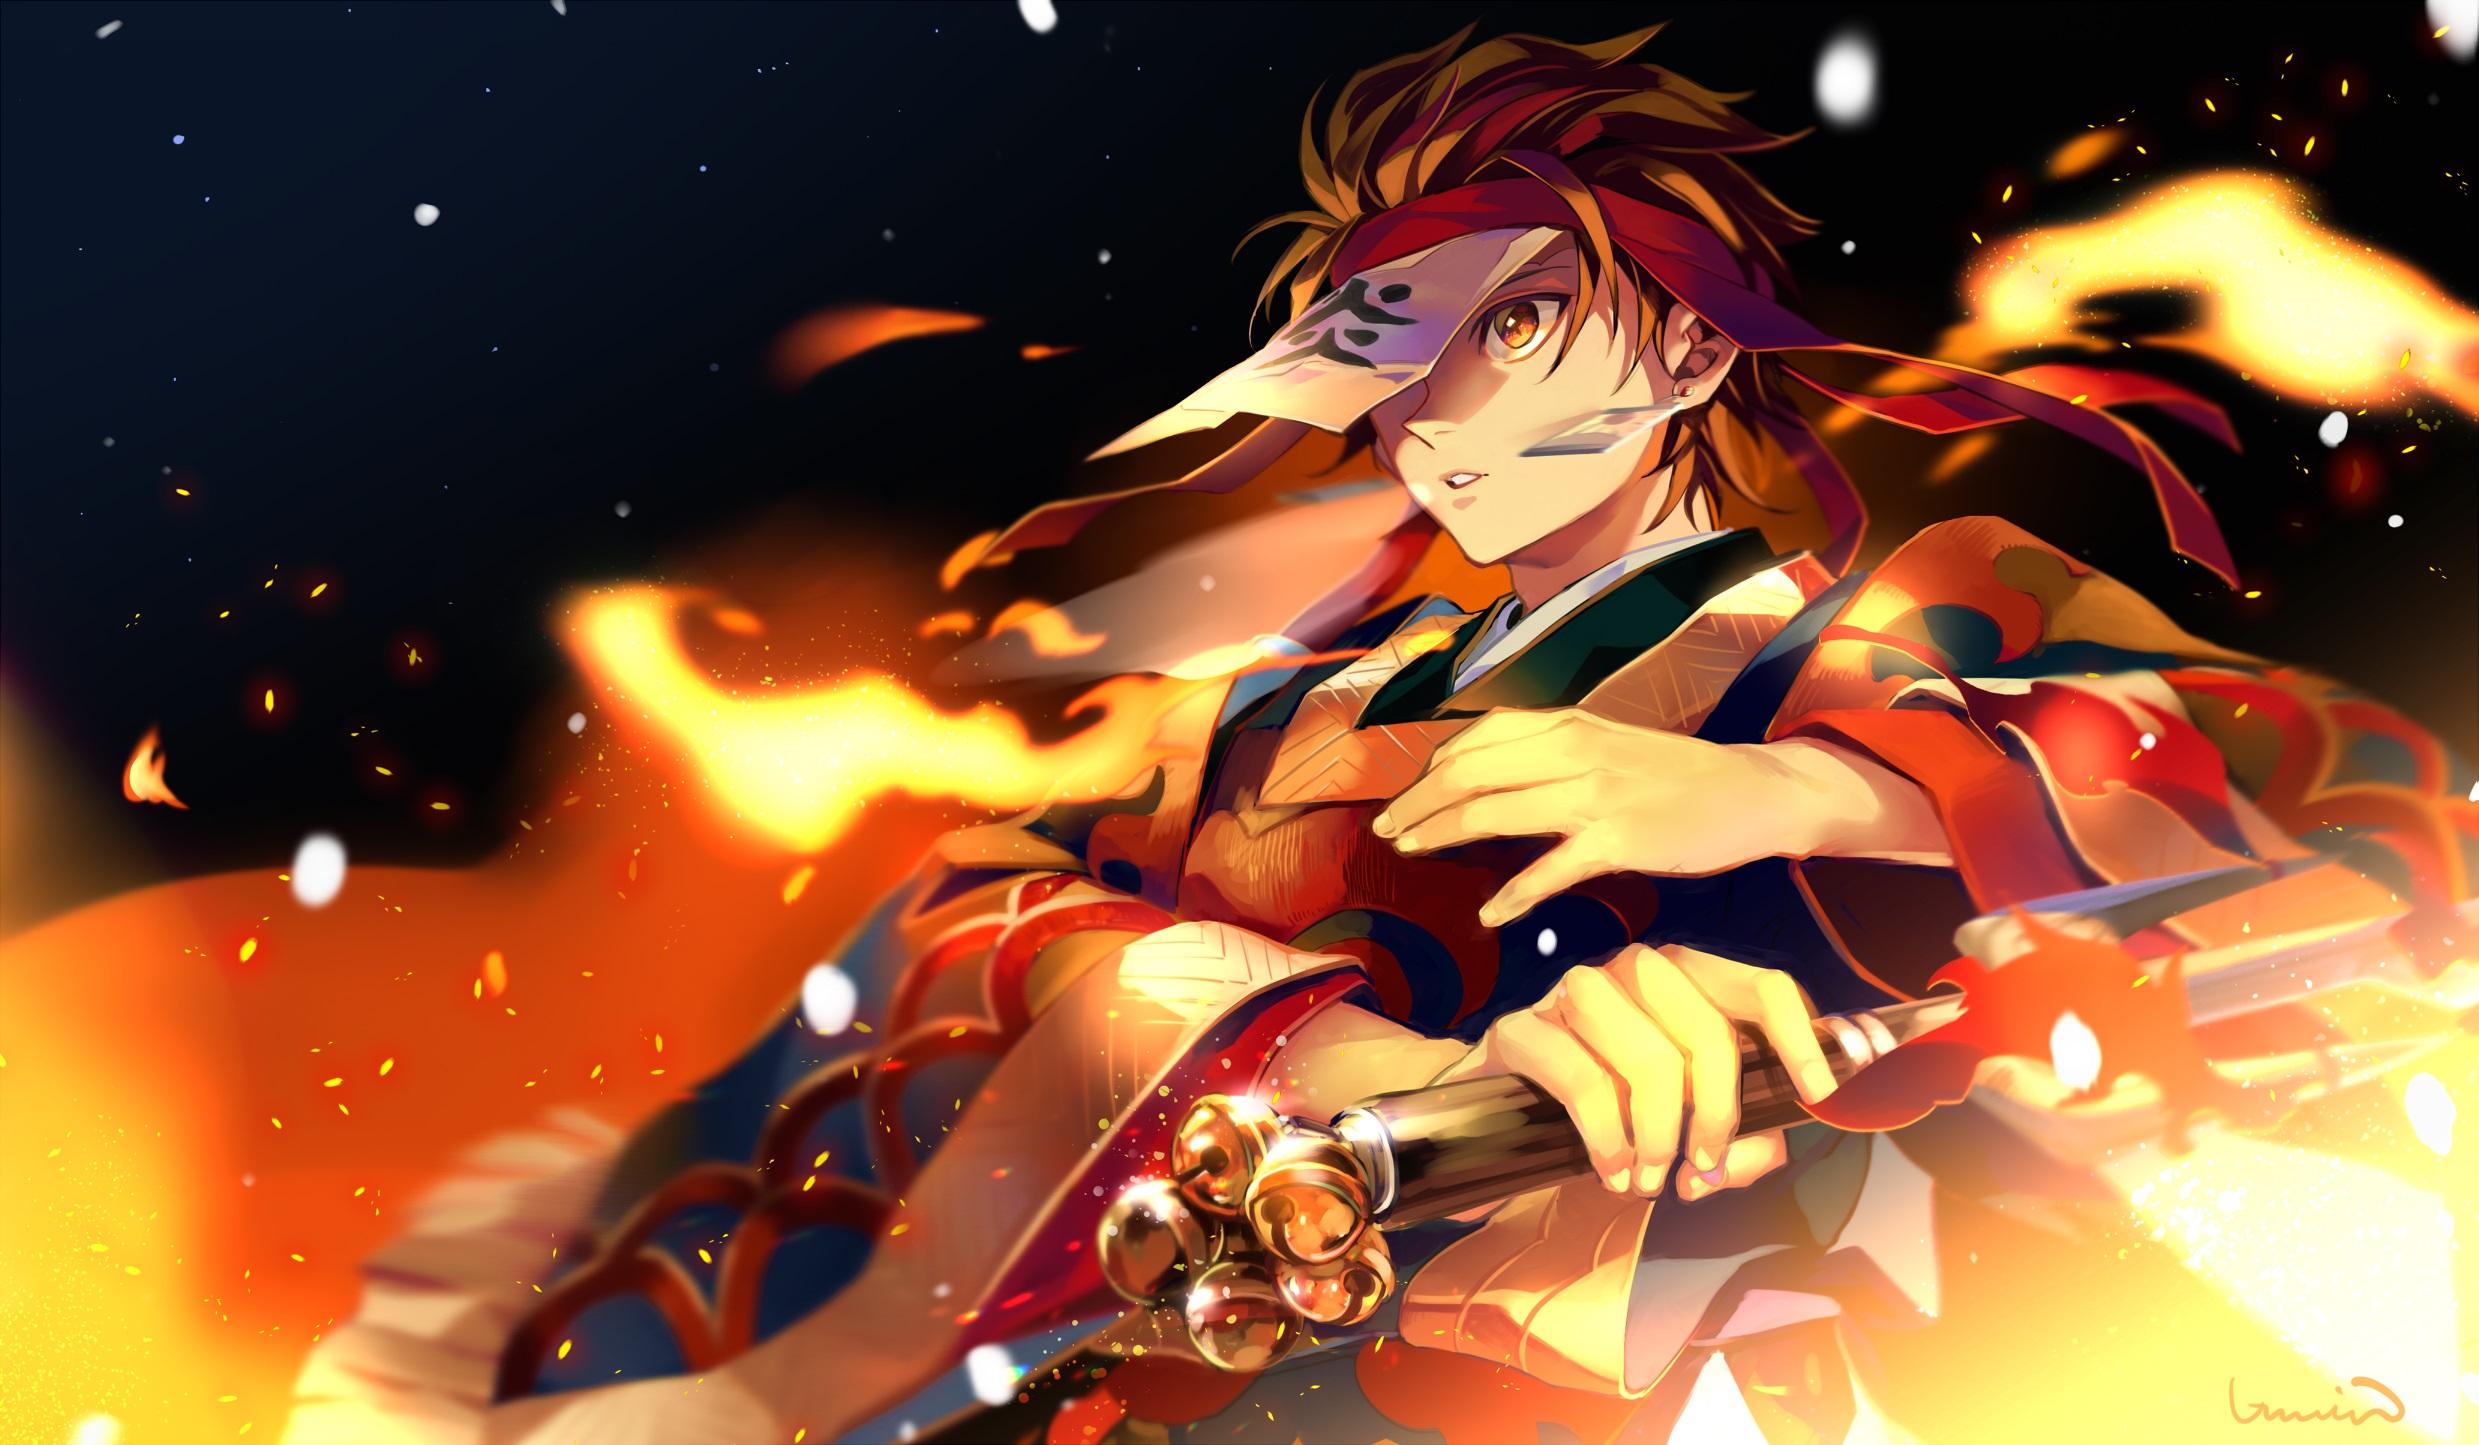 Kimetsu No Yaiba 191 2516214 Hd Wallpaper Backgrounds Download